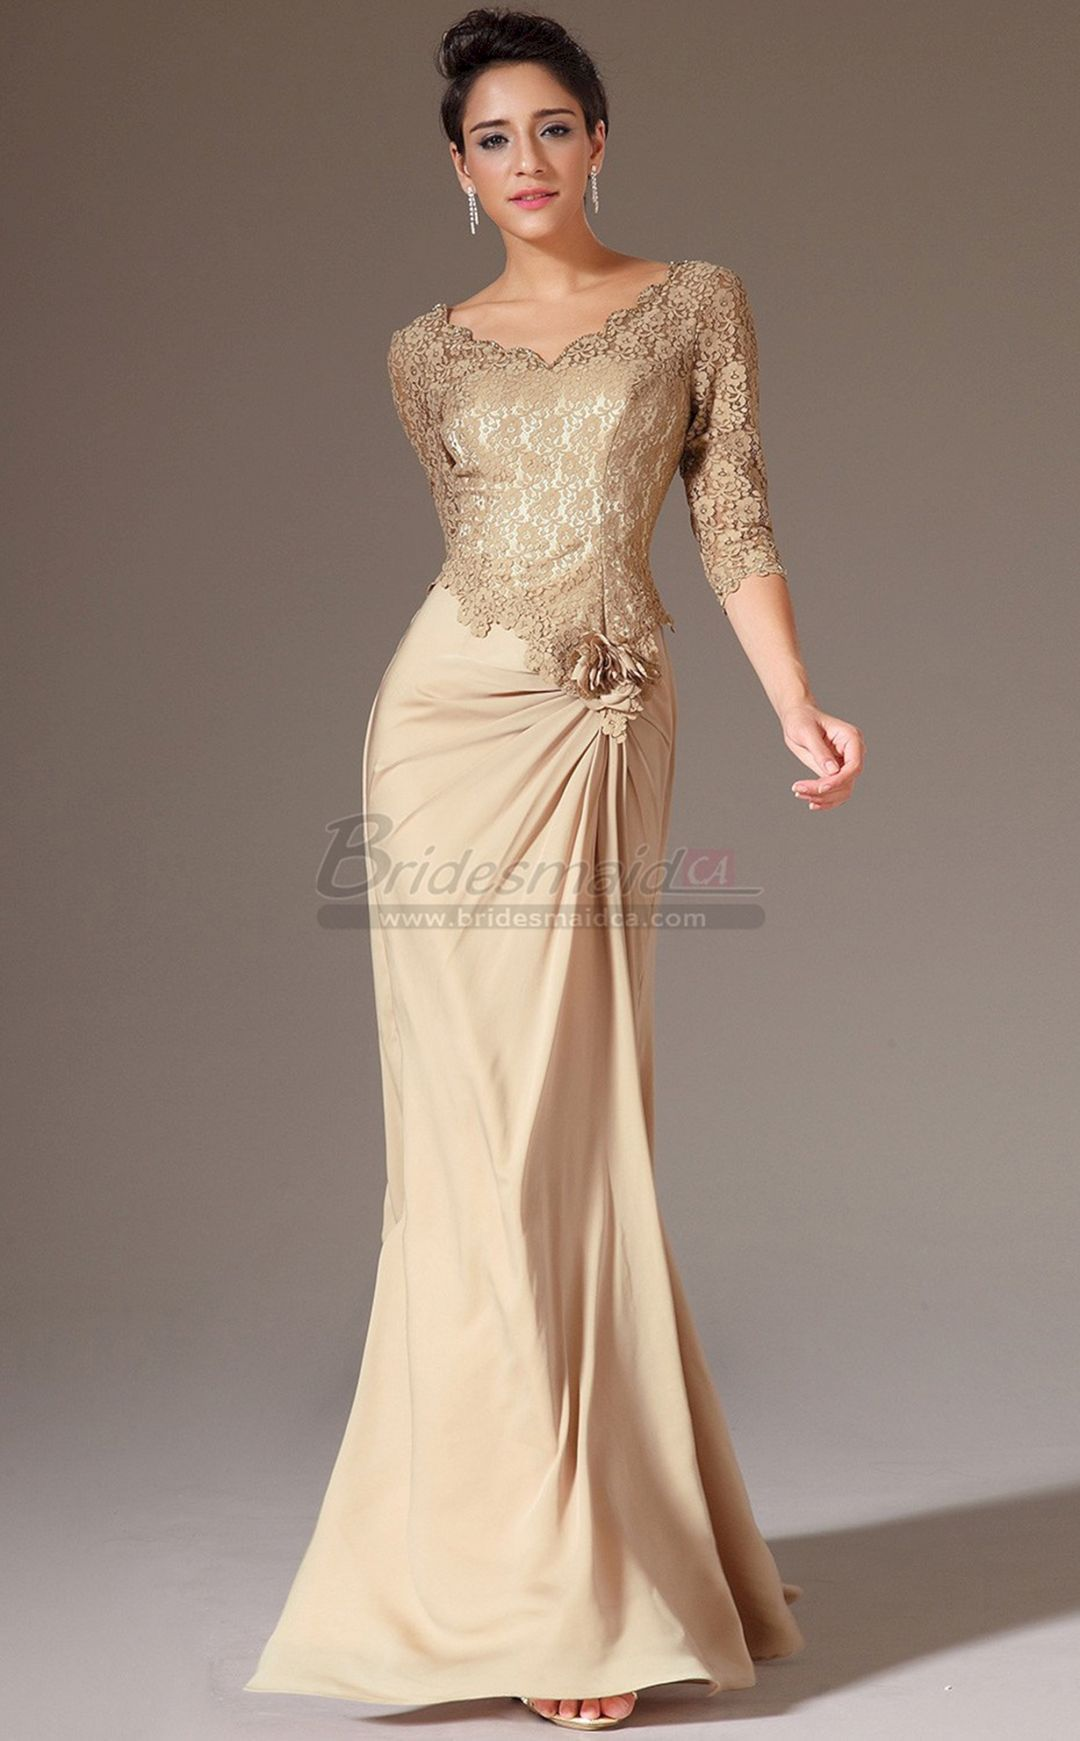 Pin On Wedding Dresses Ideas [ 1741 x 1080 Pixel ]